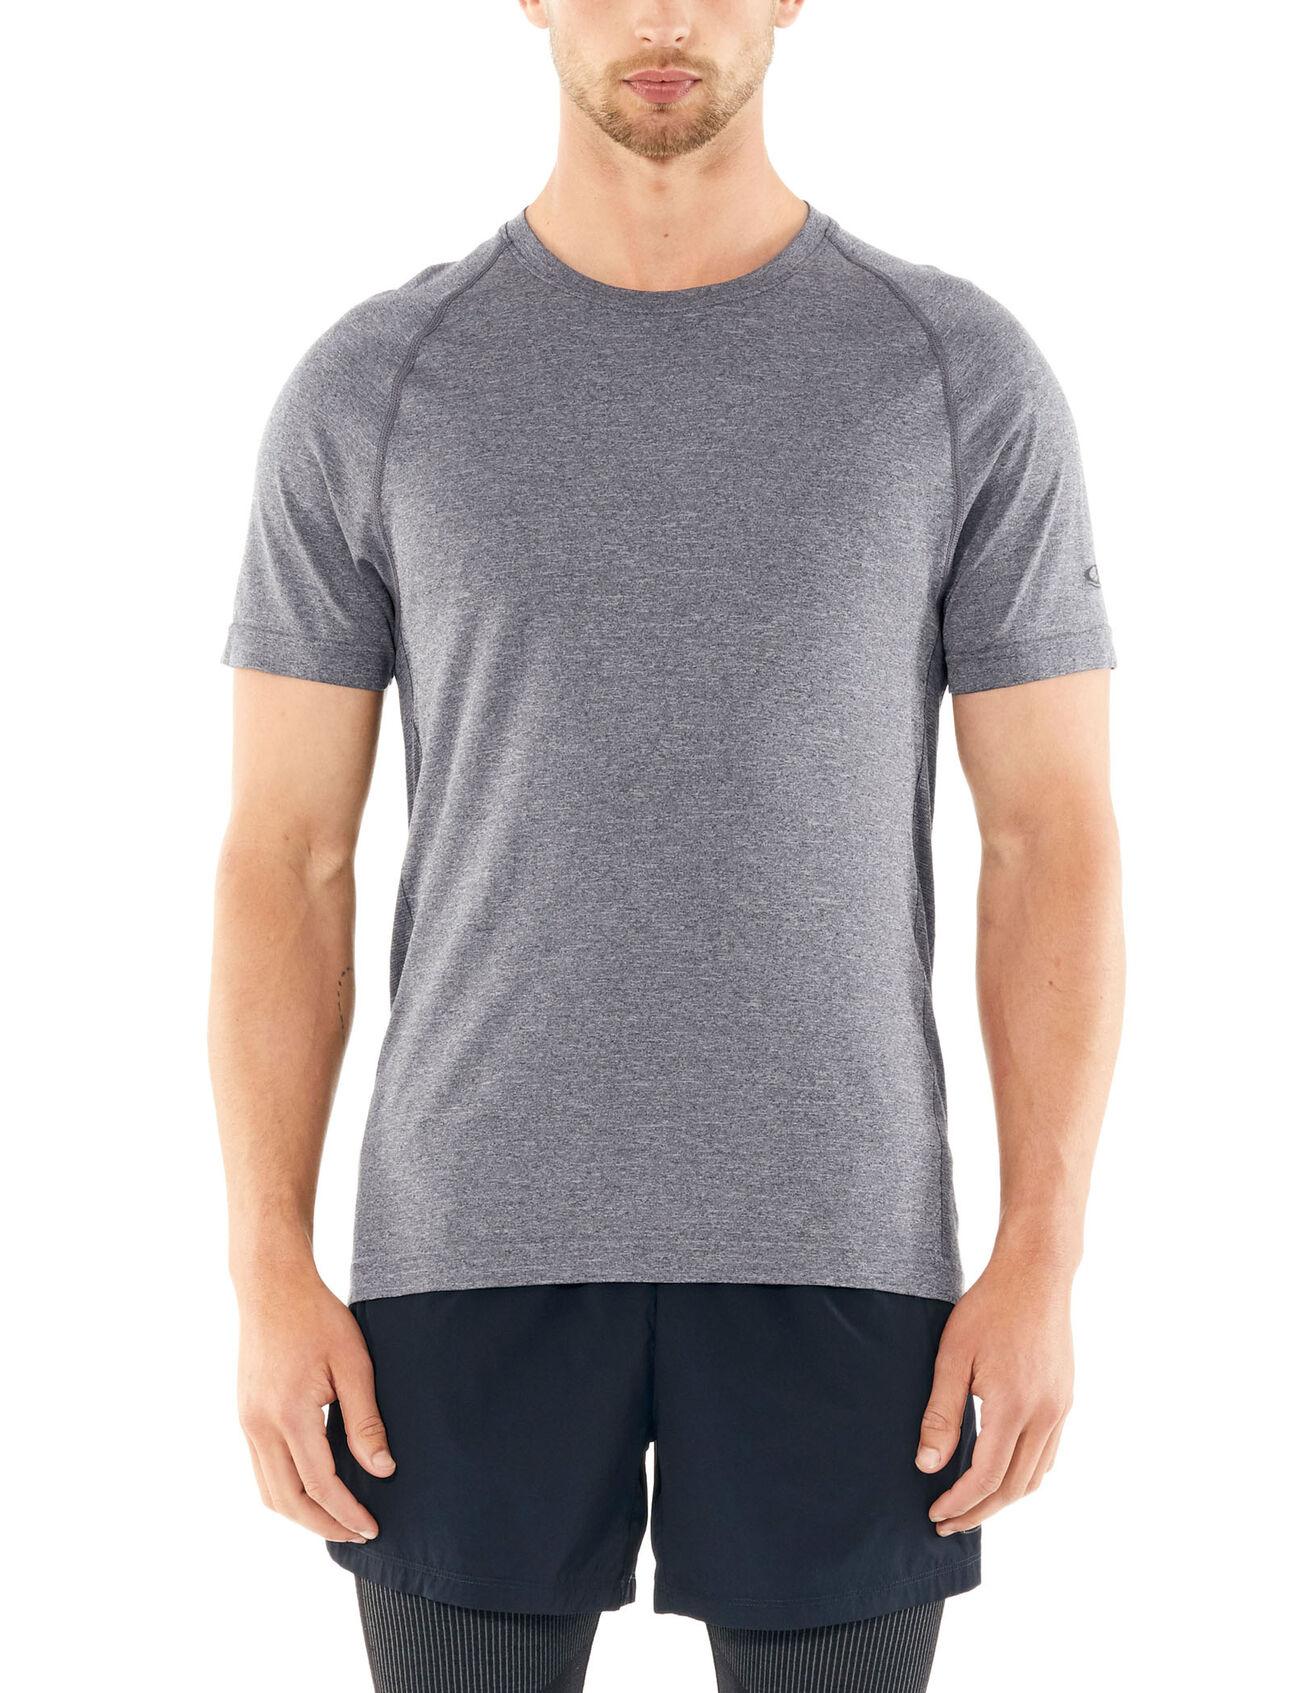 Cool-Lite™ Merino Motion Seamless Short Sleeve Crewe T-Shirt